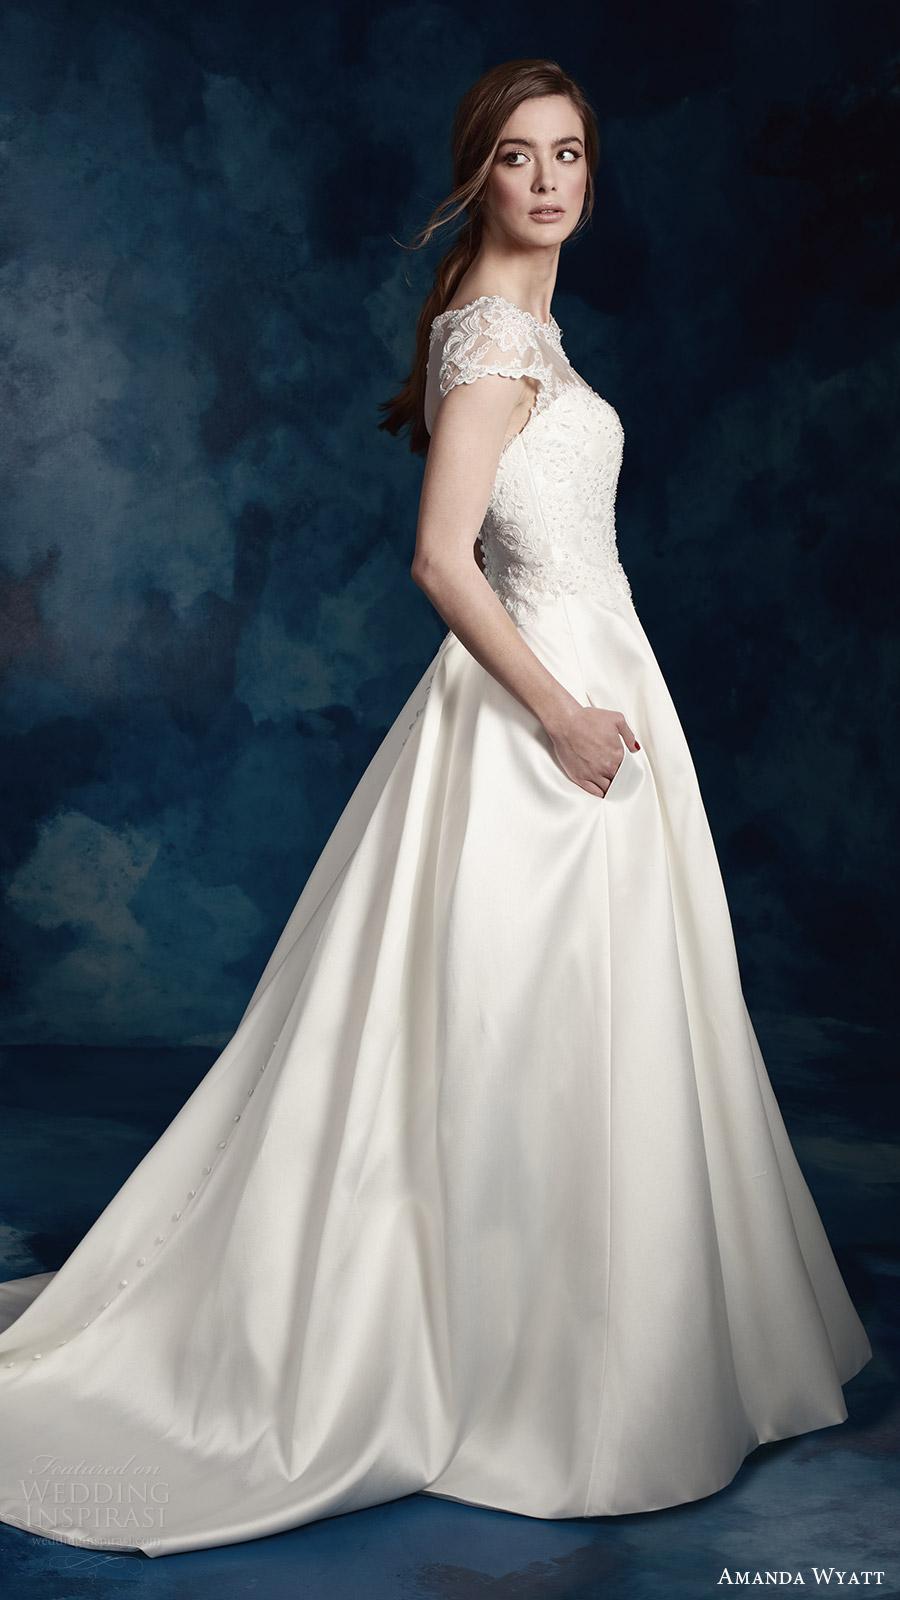 amanda wyatt bridal 2017 cap sleeves sweetheart illusion jewel a line wedding dress (wren) sv pockets train romantic